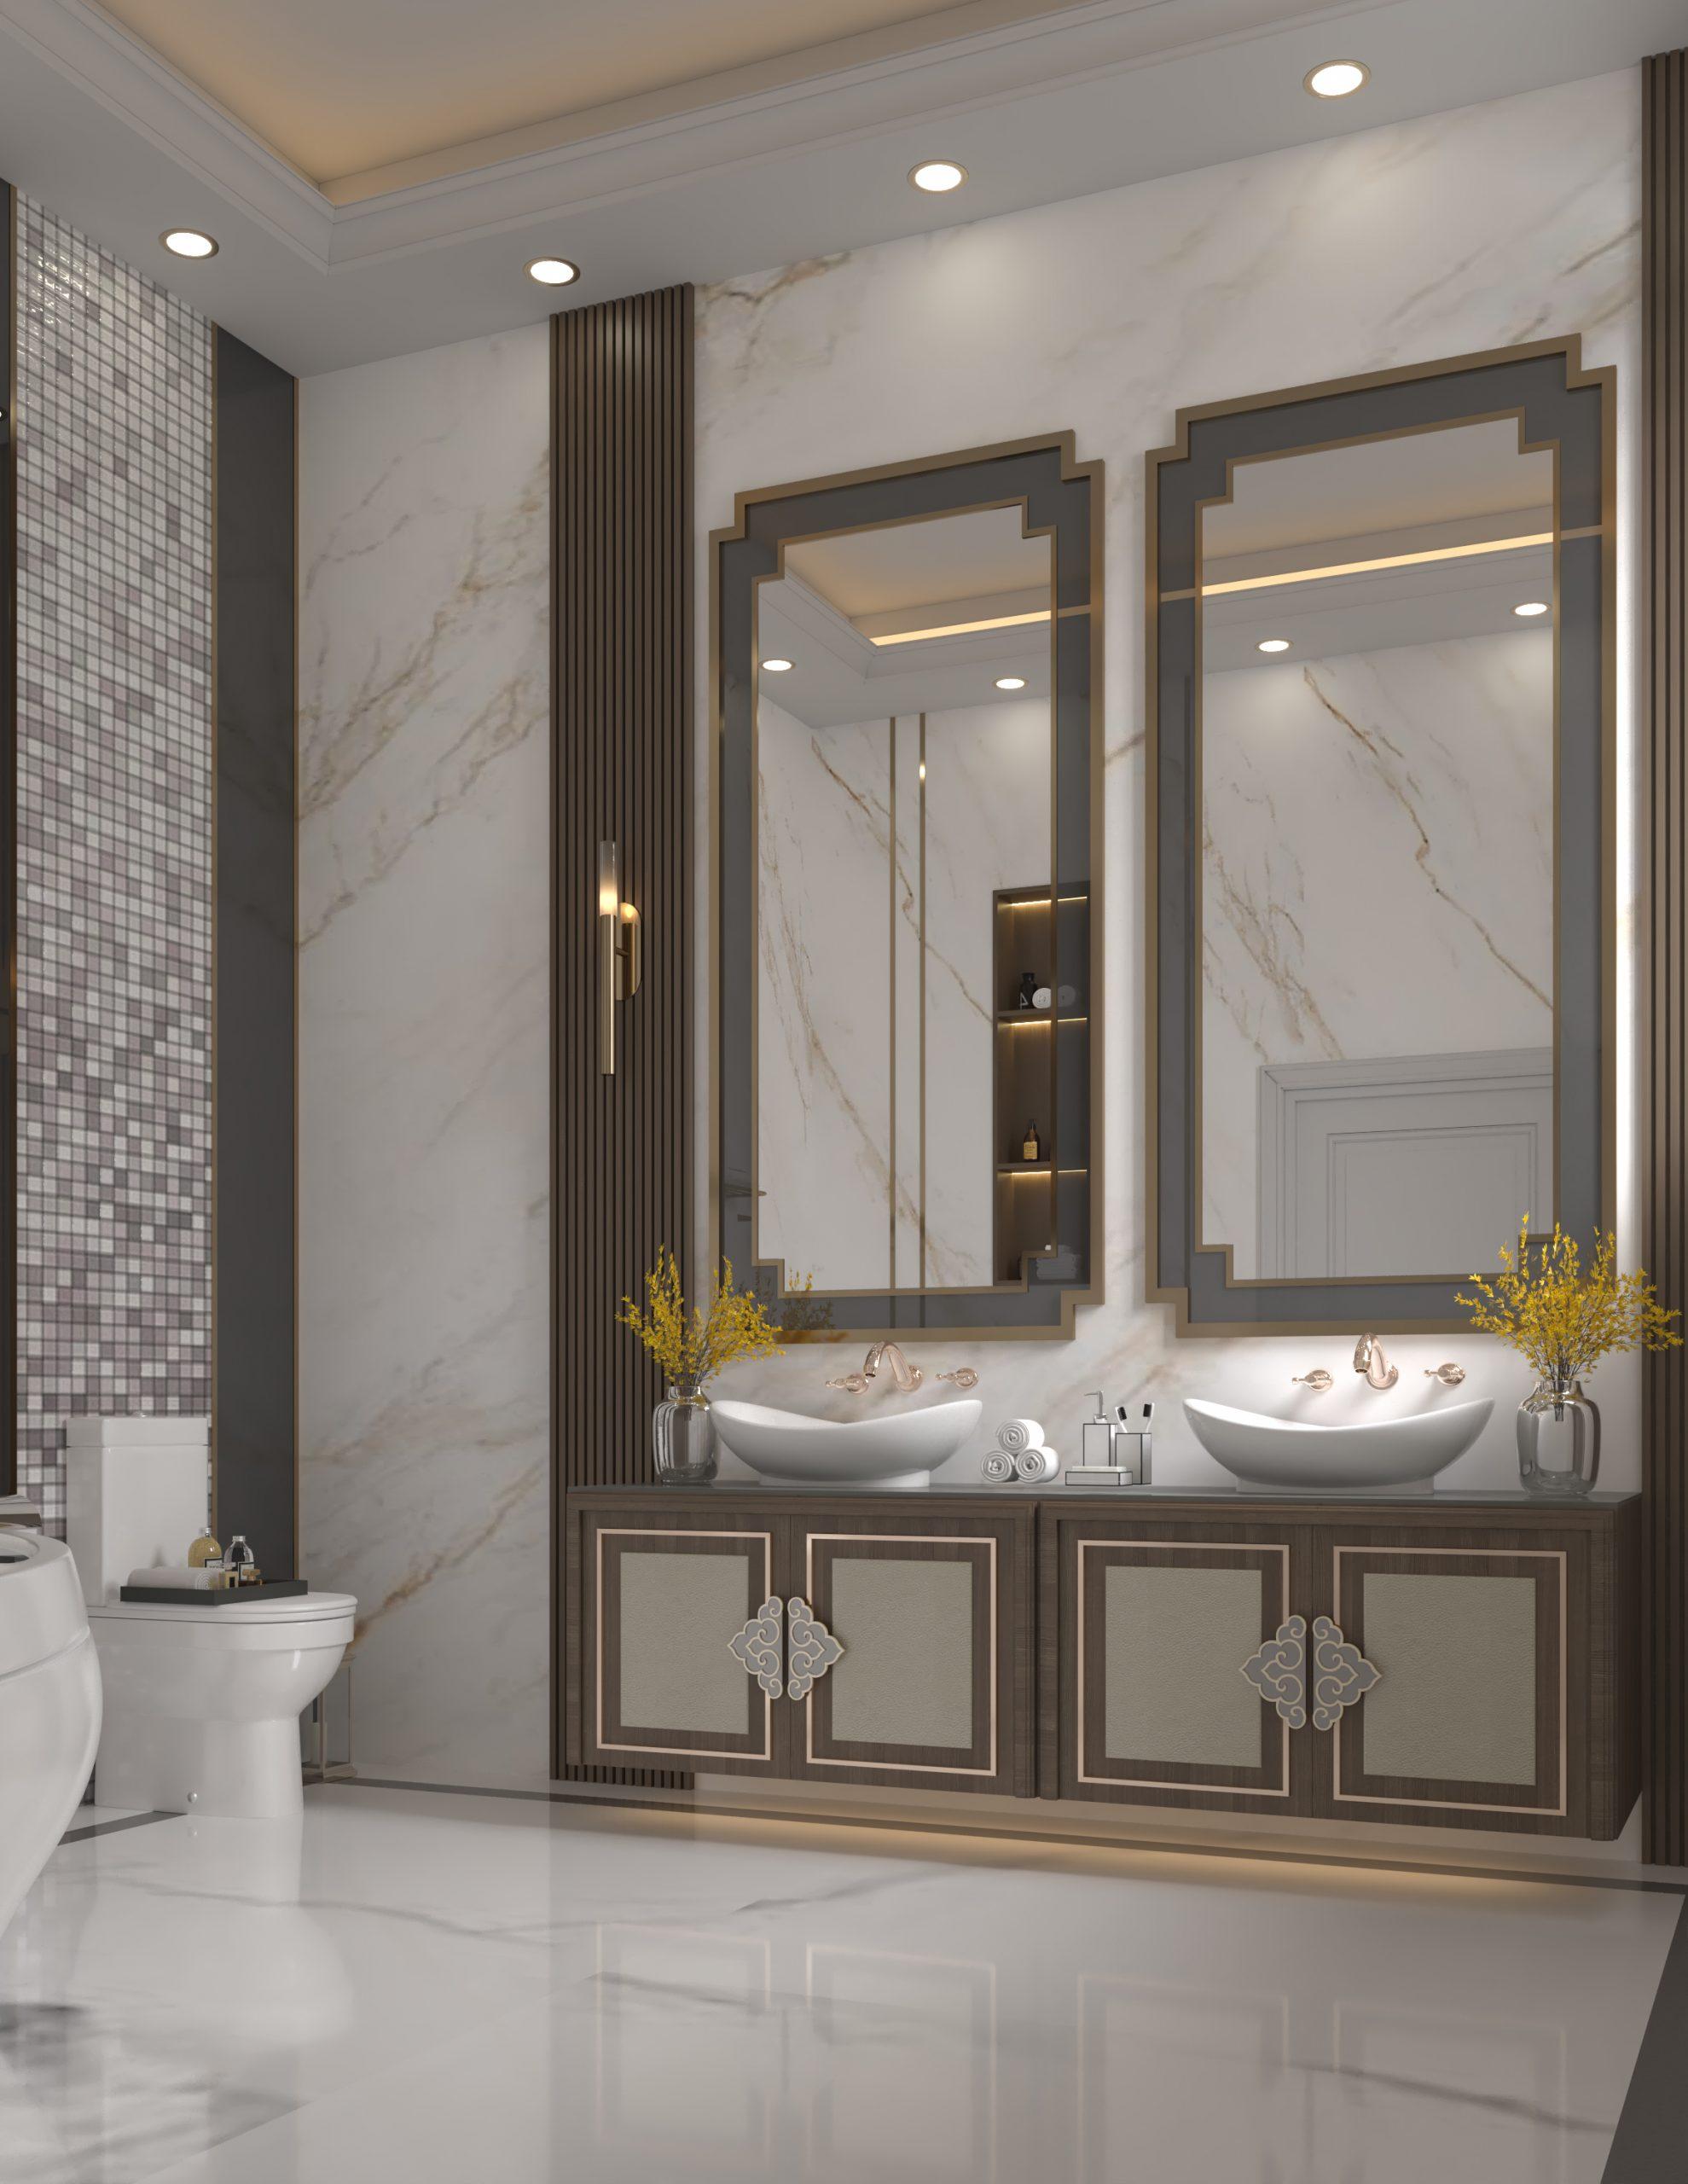 MASTER BATHROOM - BROWN